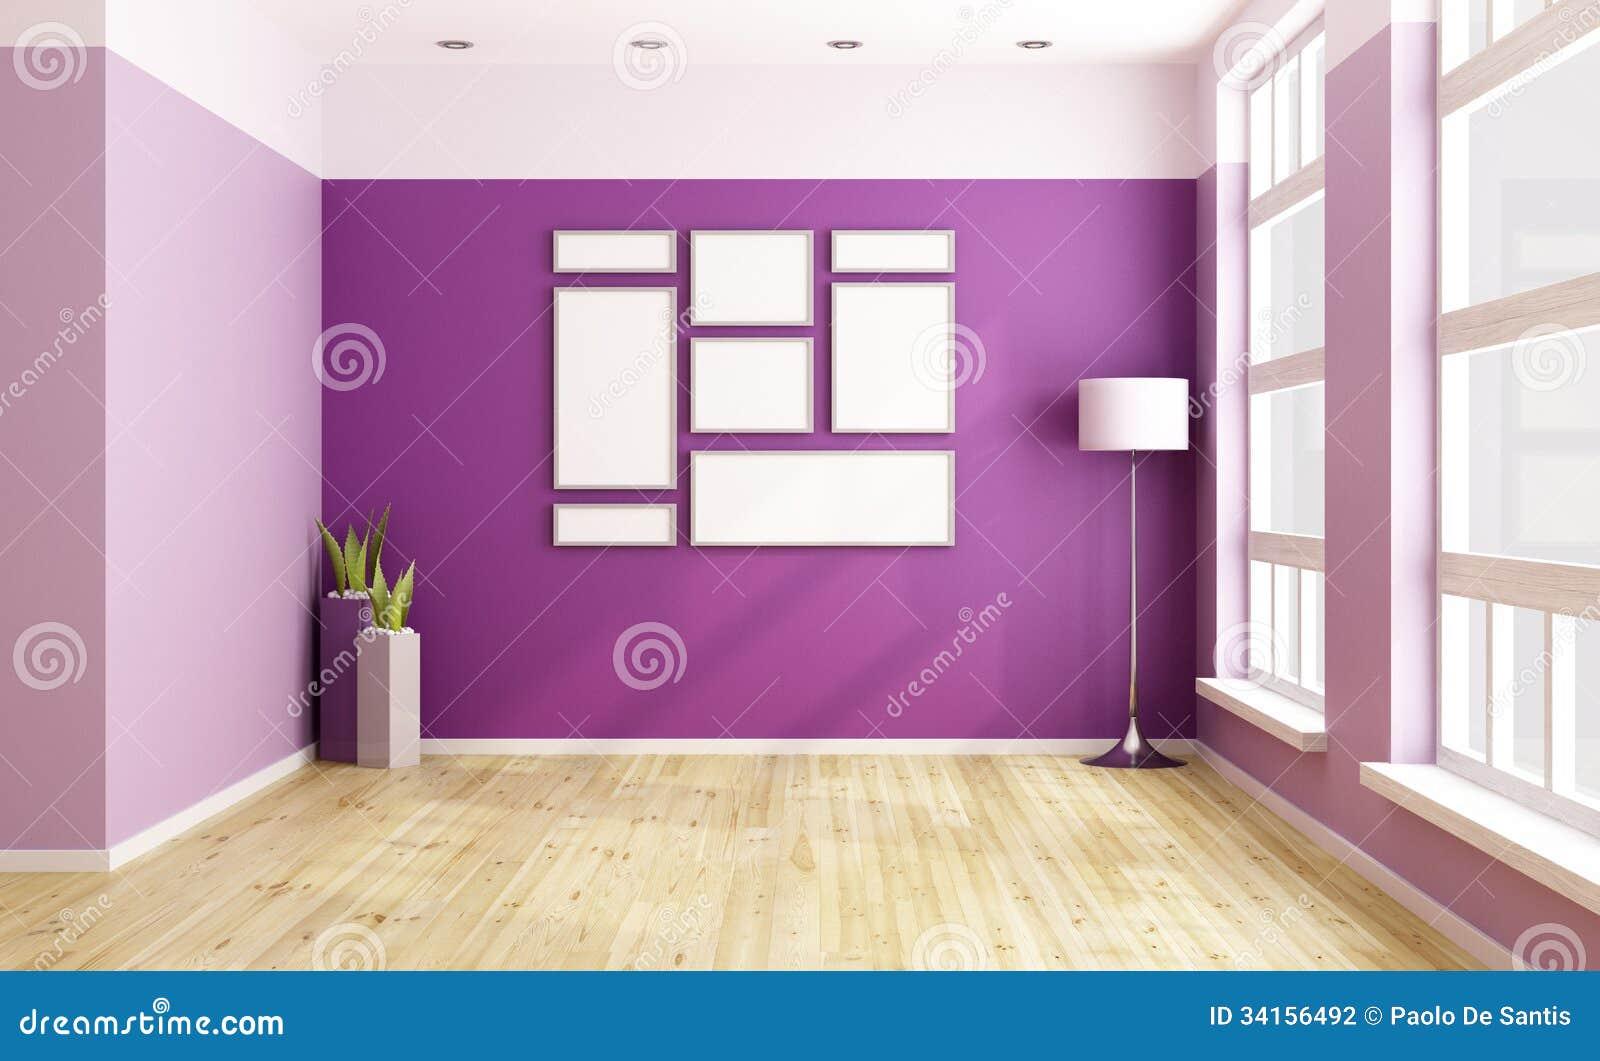 Empty Purple Room Stock Photography Image 34156492